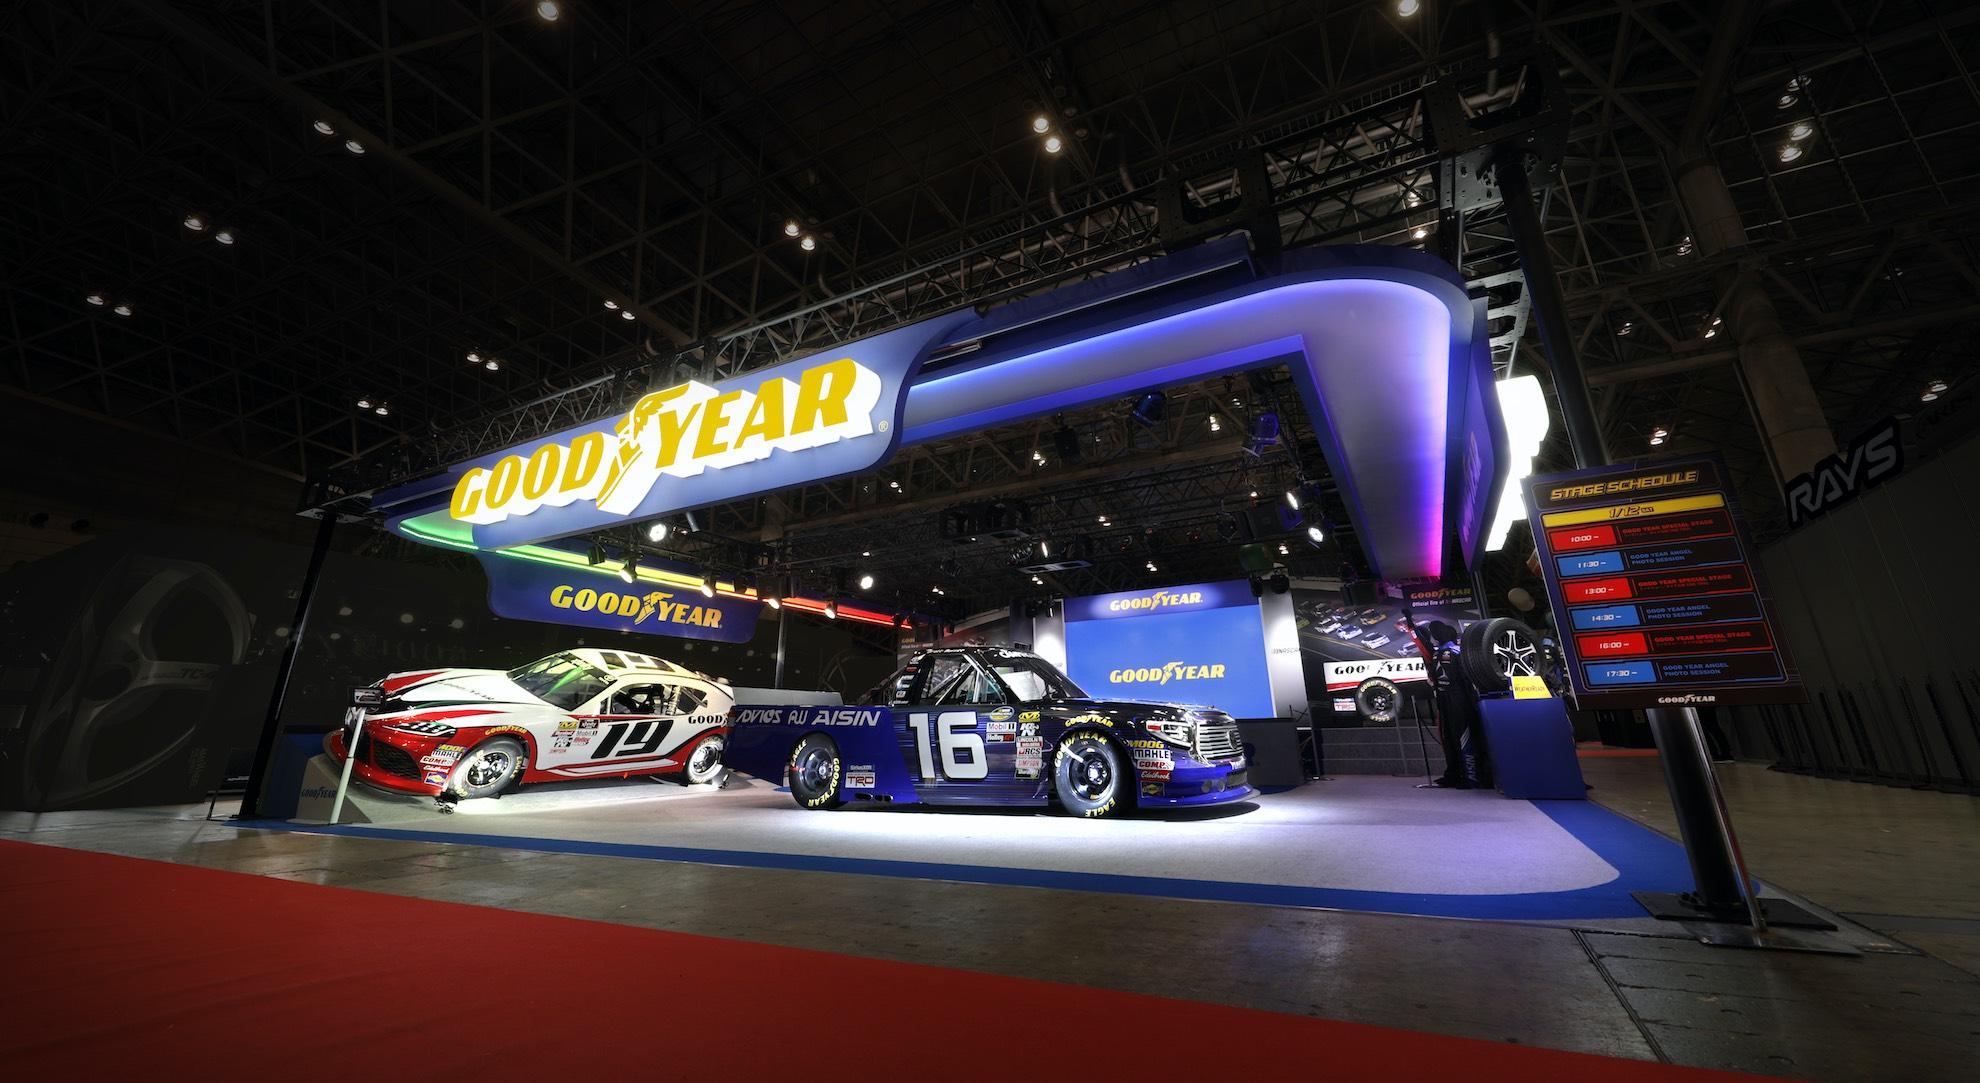 Tokyo Auto Salon 2019 / Japan GOOD YEAR Booth